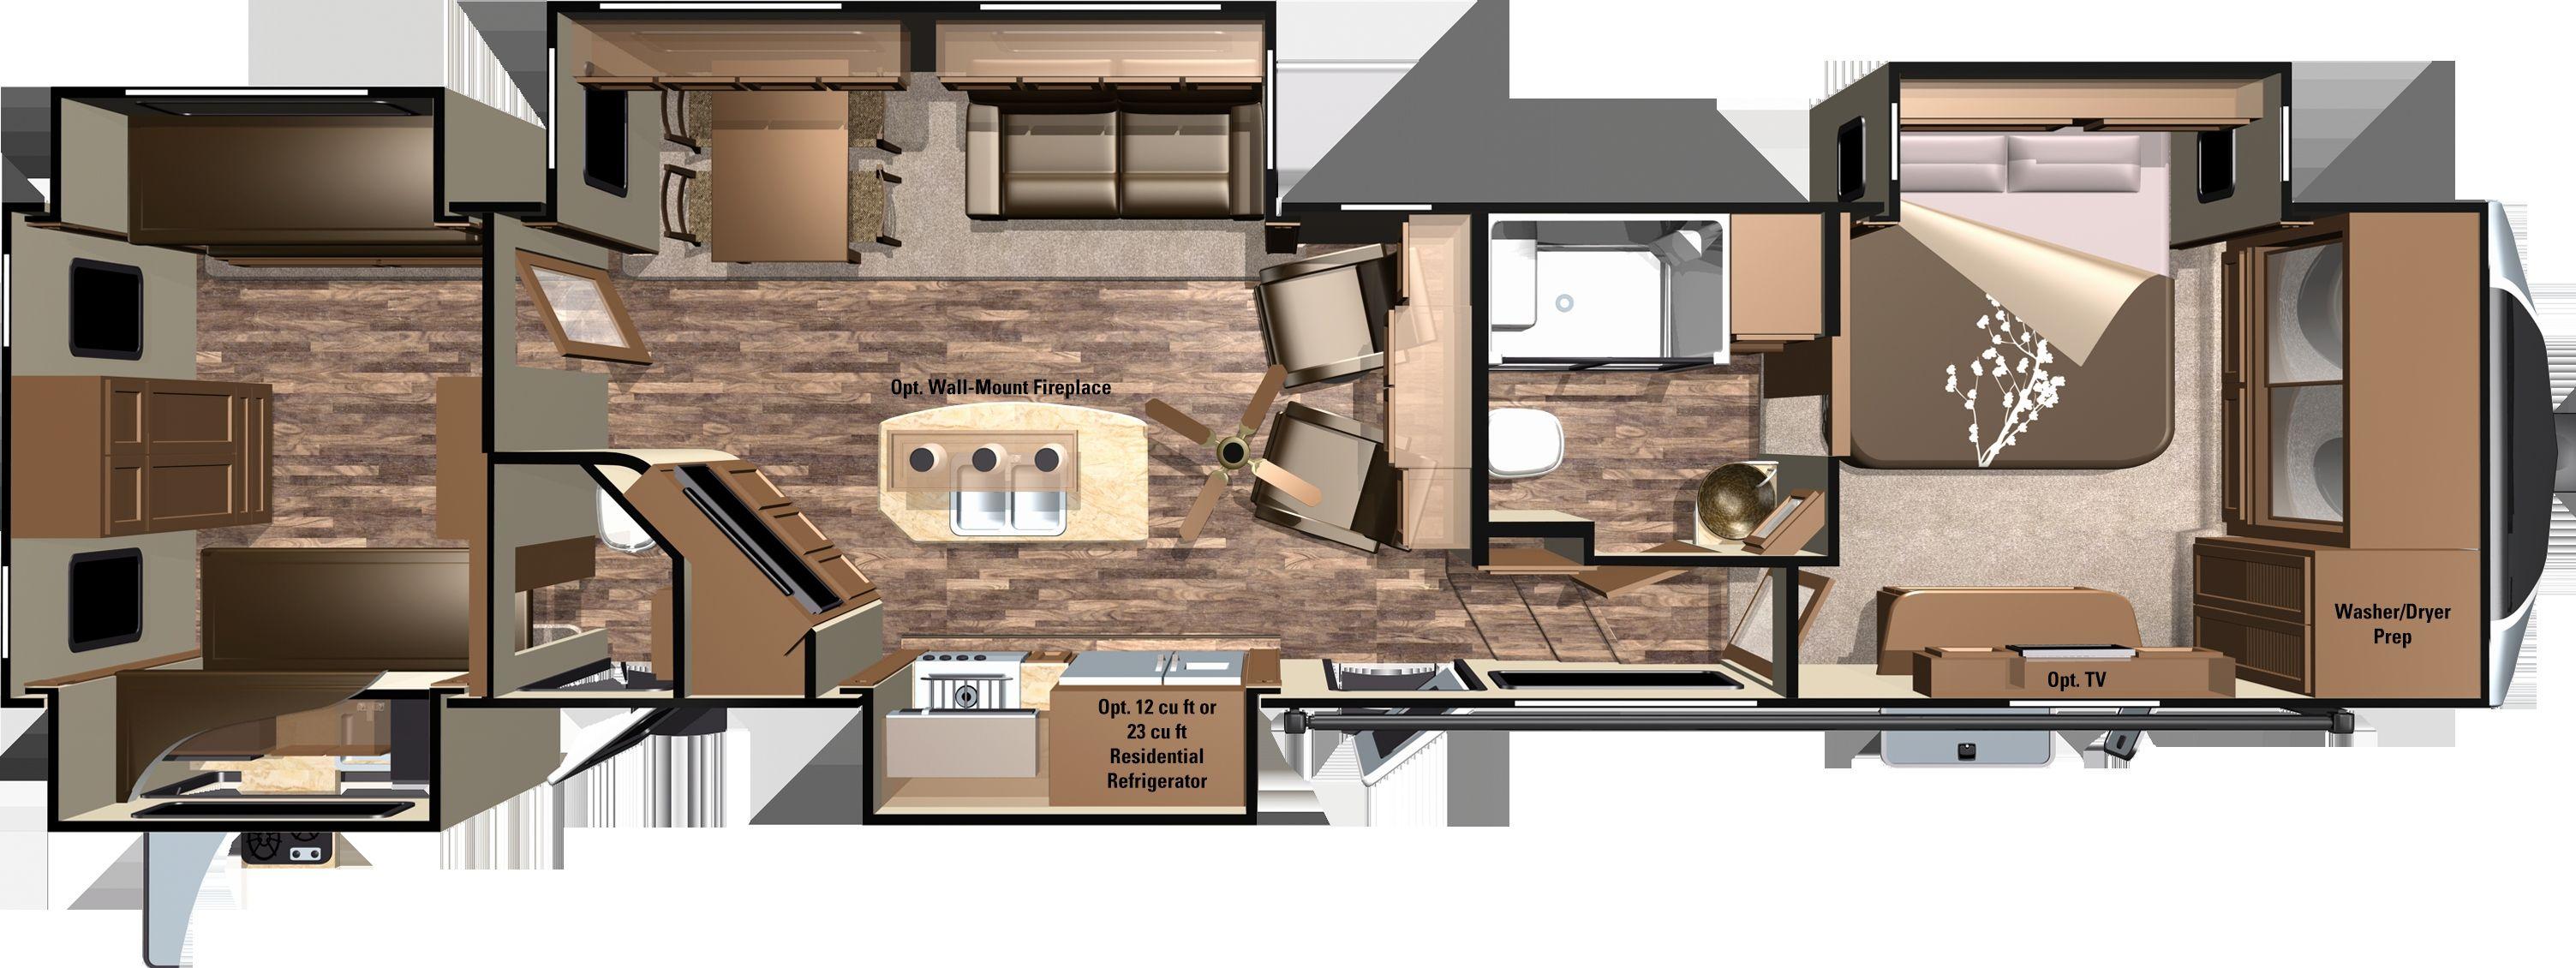 Planos De Piso De Reboque De Viagem Impressionantes Planos De Piso De Reboque De Viagem De 2 Quartos Rv Floor Plans Travel Trailer Floor Plans Camper Flooring